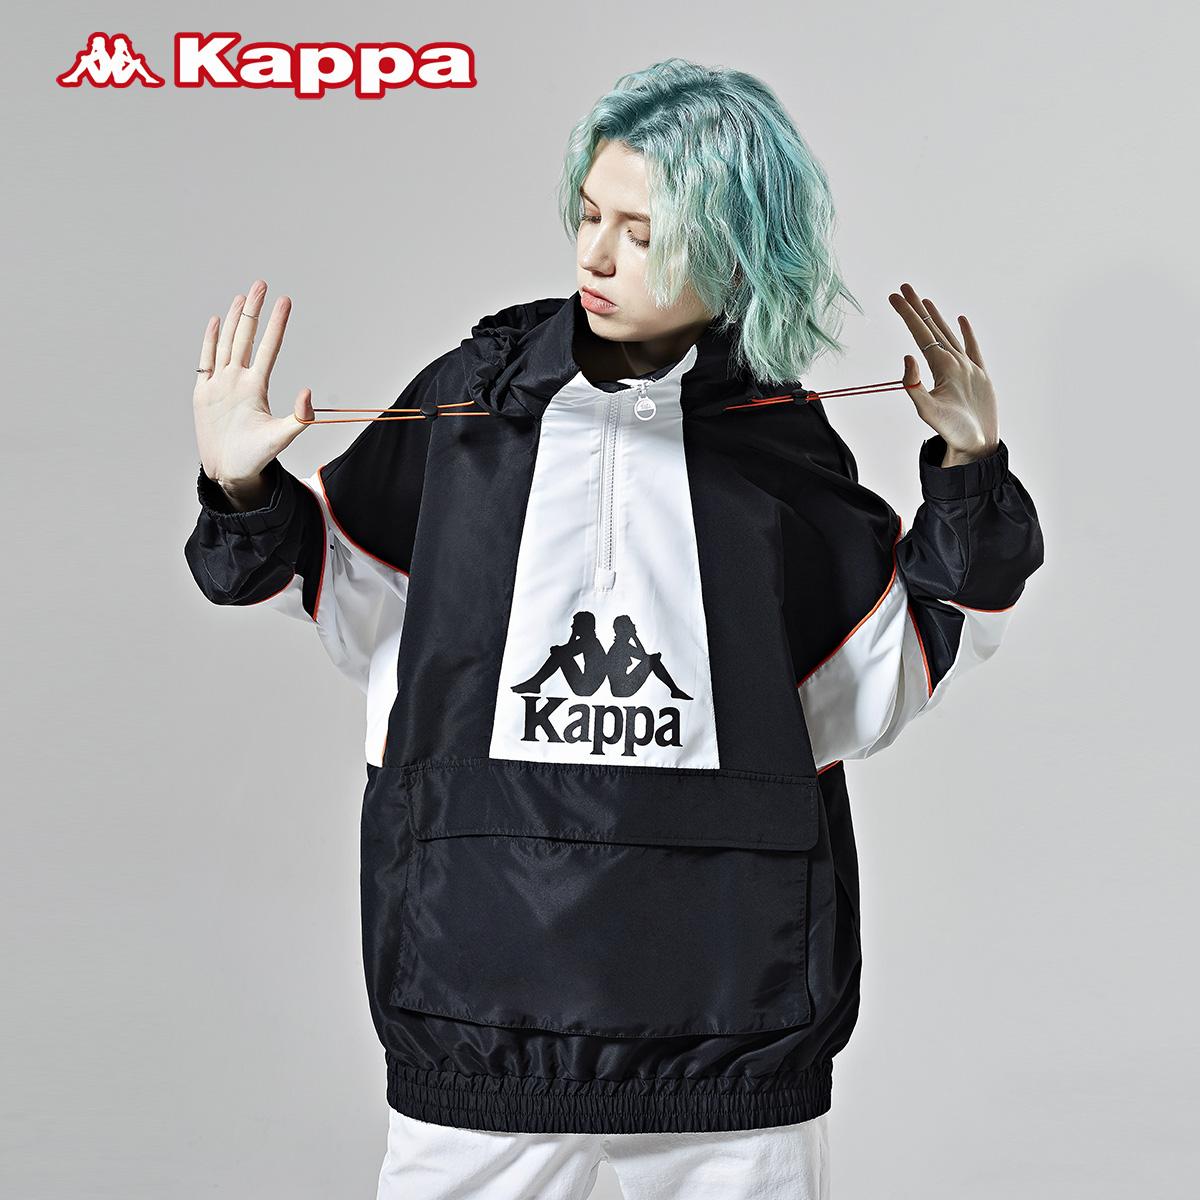 kappa卡帕情侶男女防風衣春季休閑外套連帽運動衛衣上衣2020新款